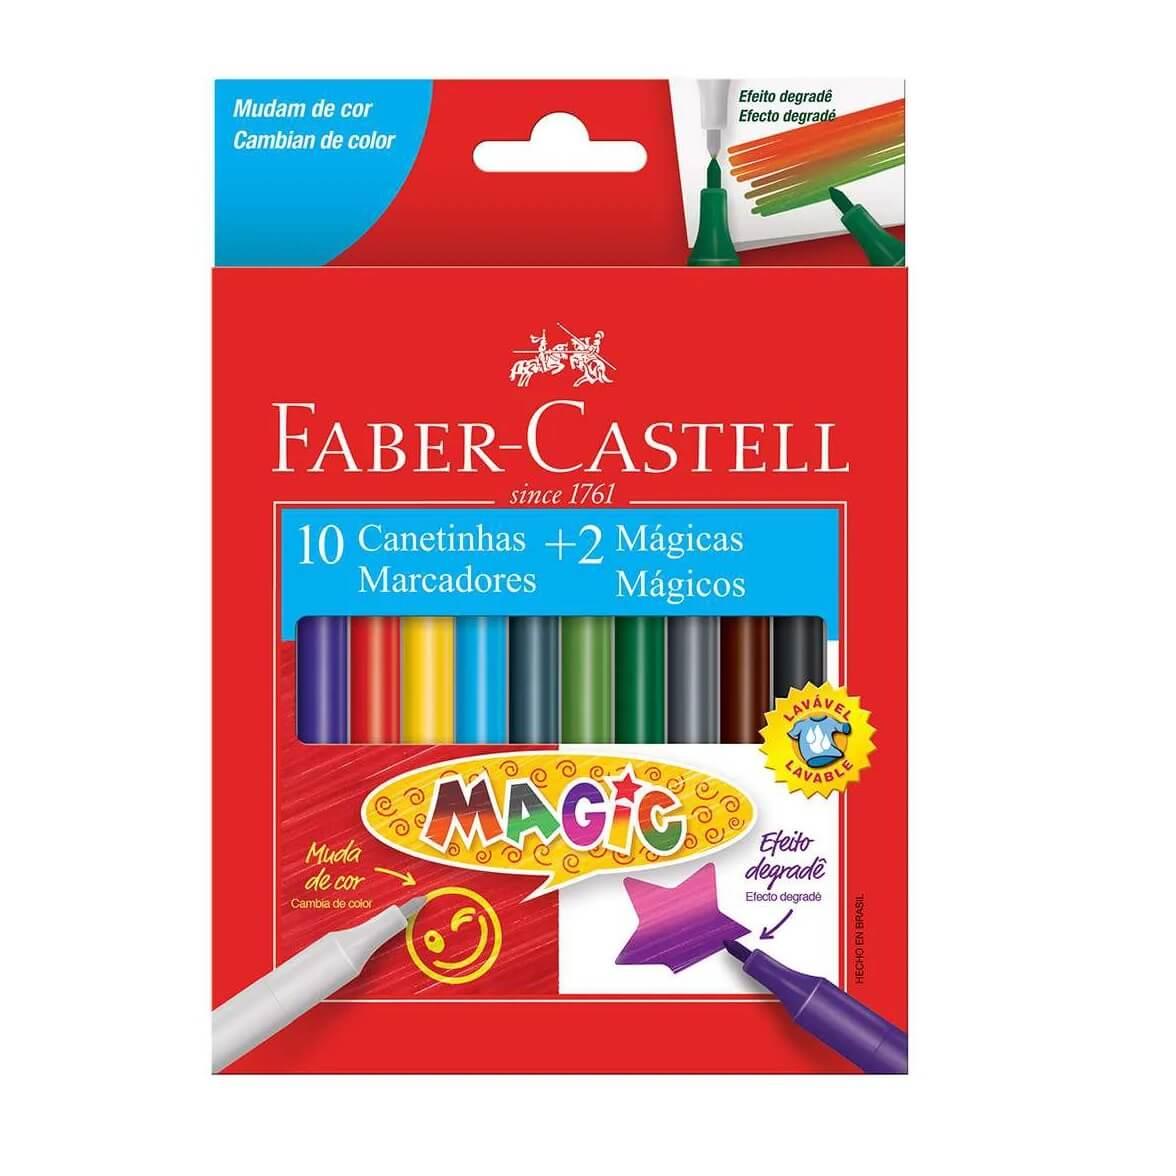 Canetinha Magic - Faber-Castell